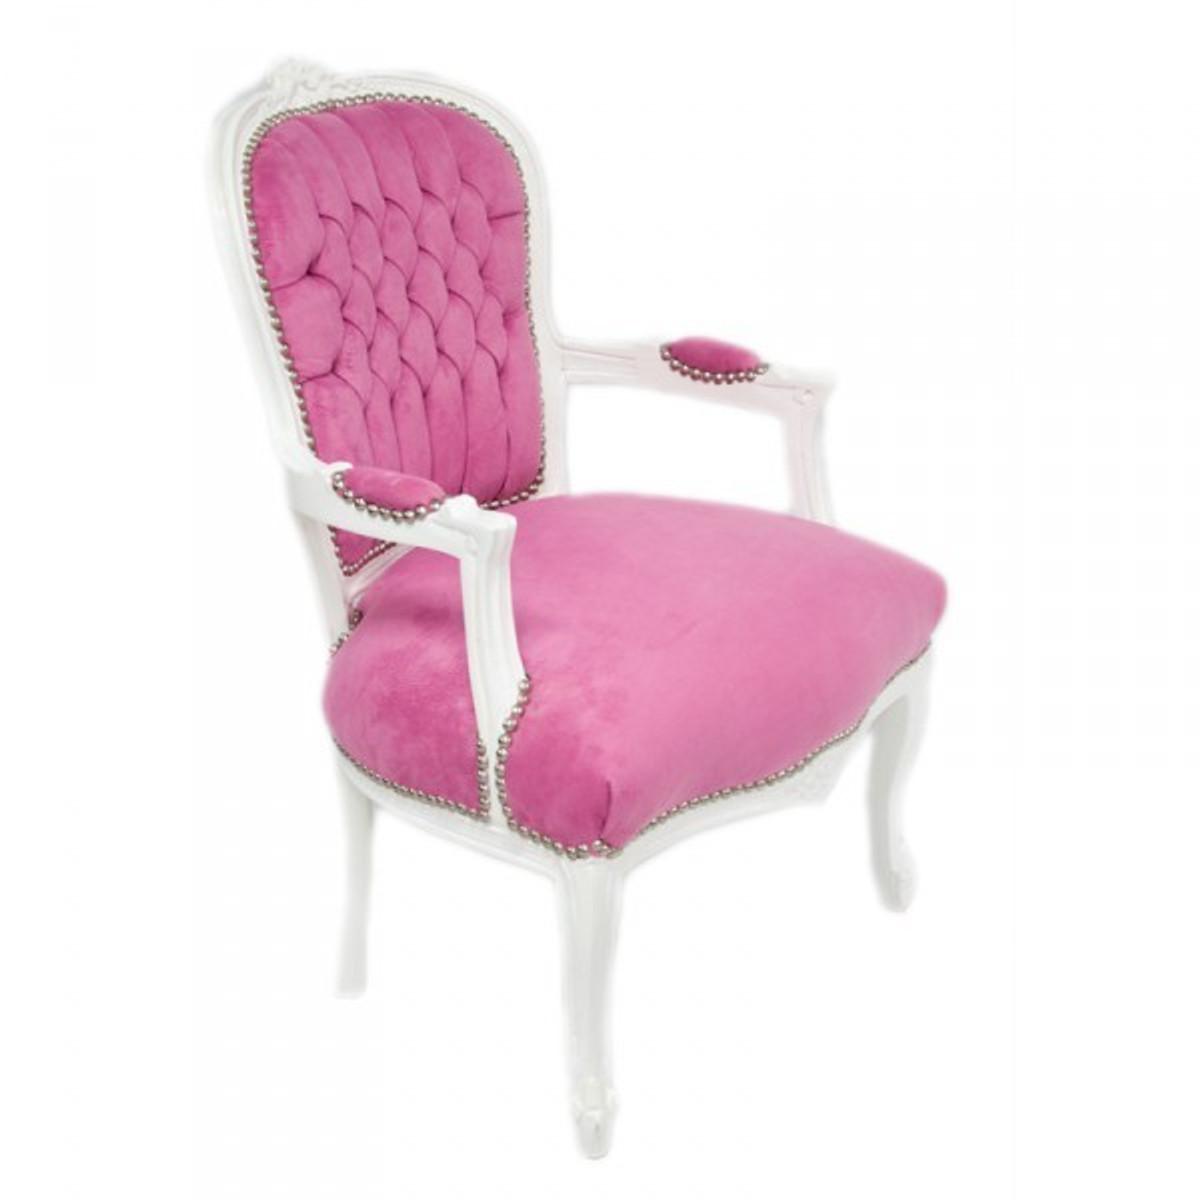 casa padrino barock salon stuhl mod1 rosa weiss st hle. Black Bedroom Furniture Sets. Home Design Ideas